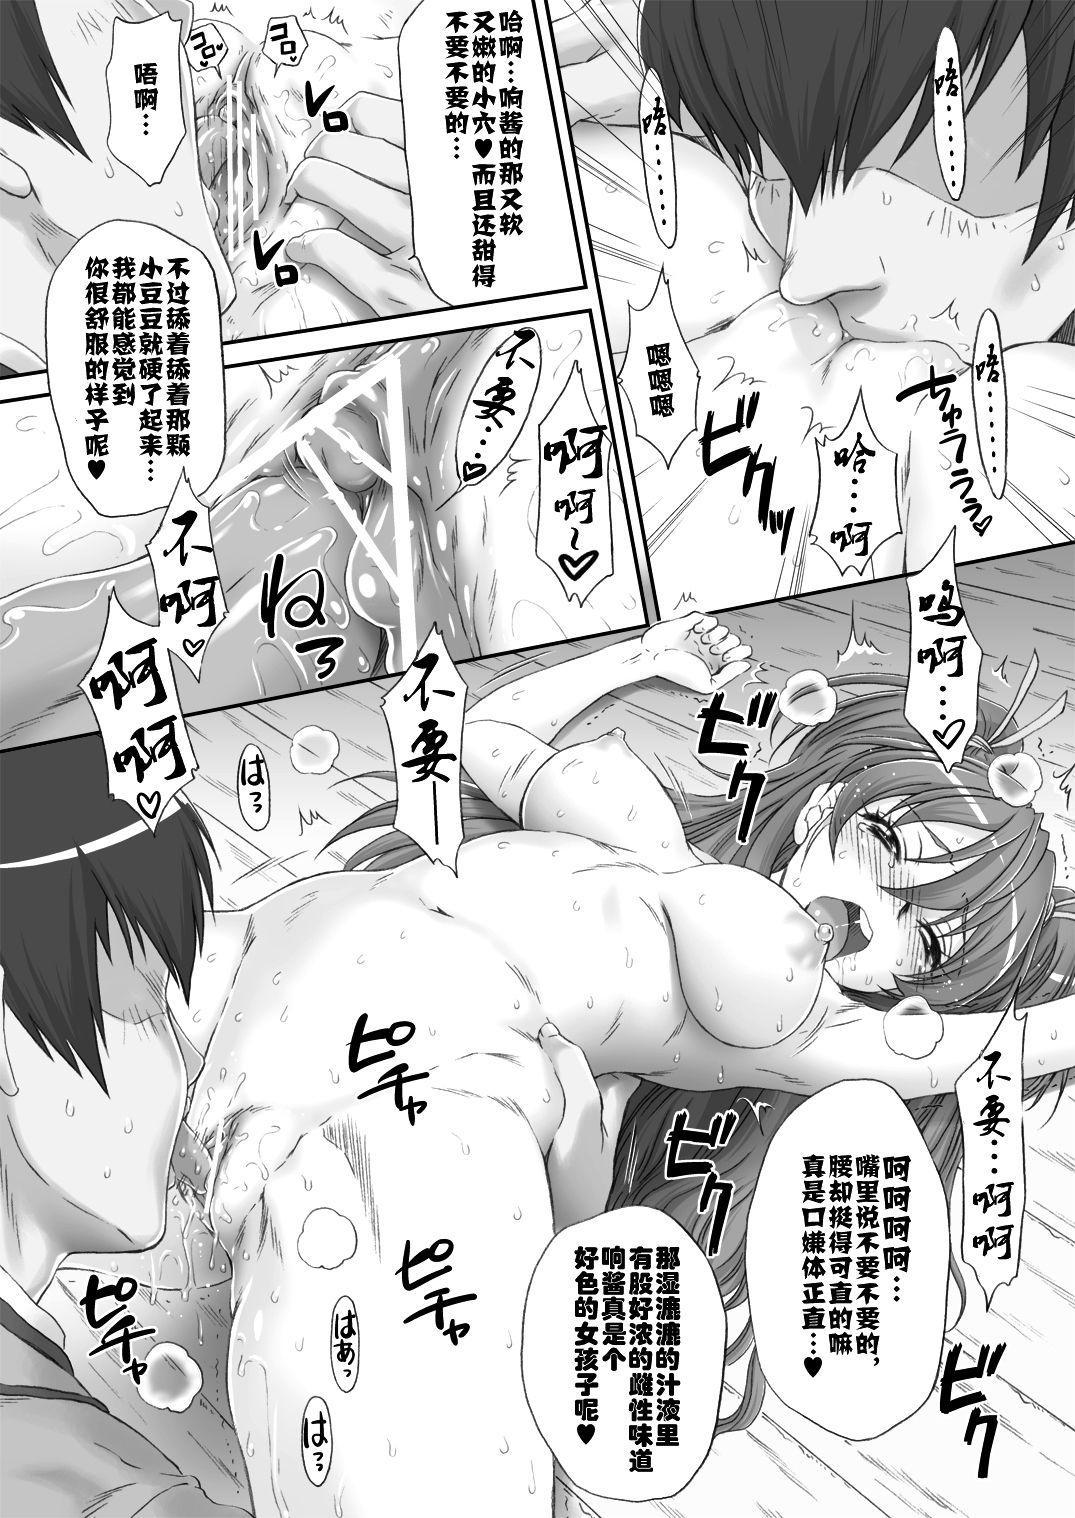 Hibiki de asobou ♪ 13